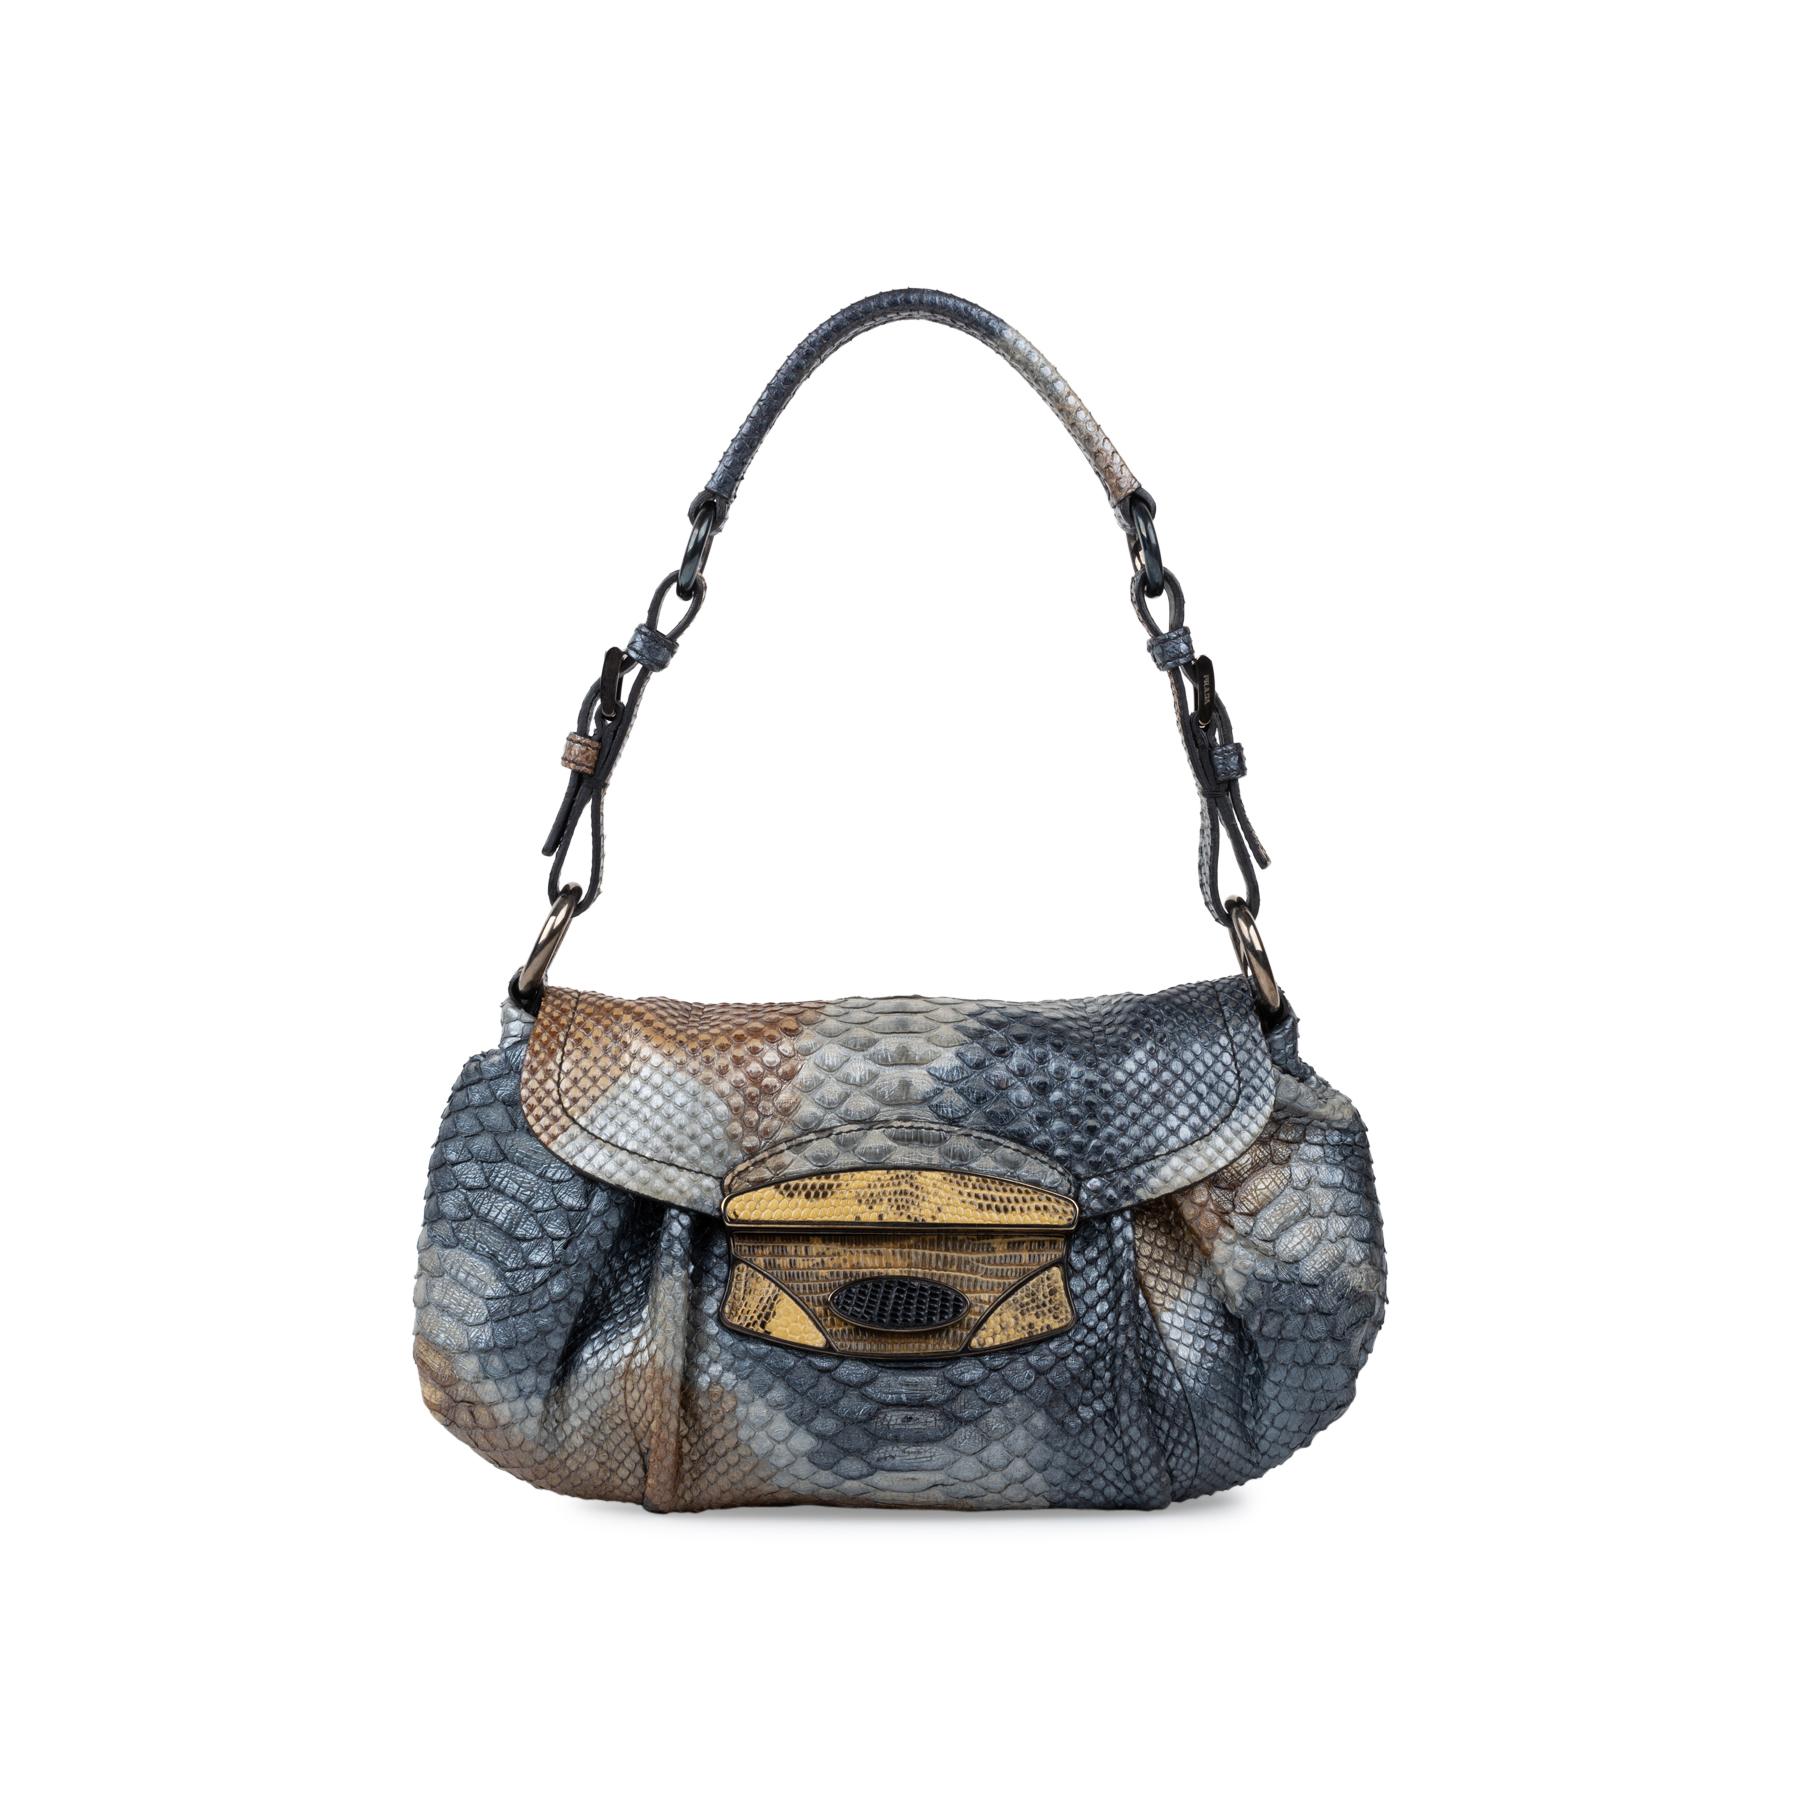 1cf44f133b Authentic Second Hand Prada Python and Lizard Pushlock Handbag  (PSS-534-00001)